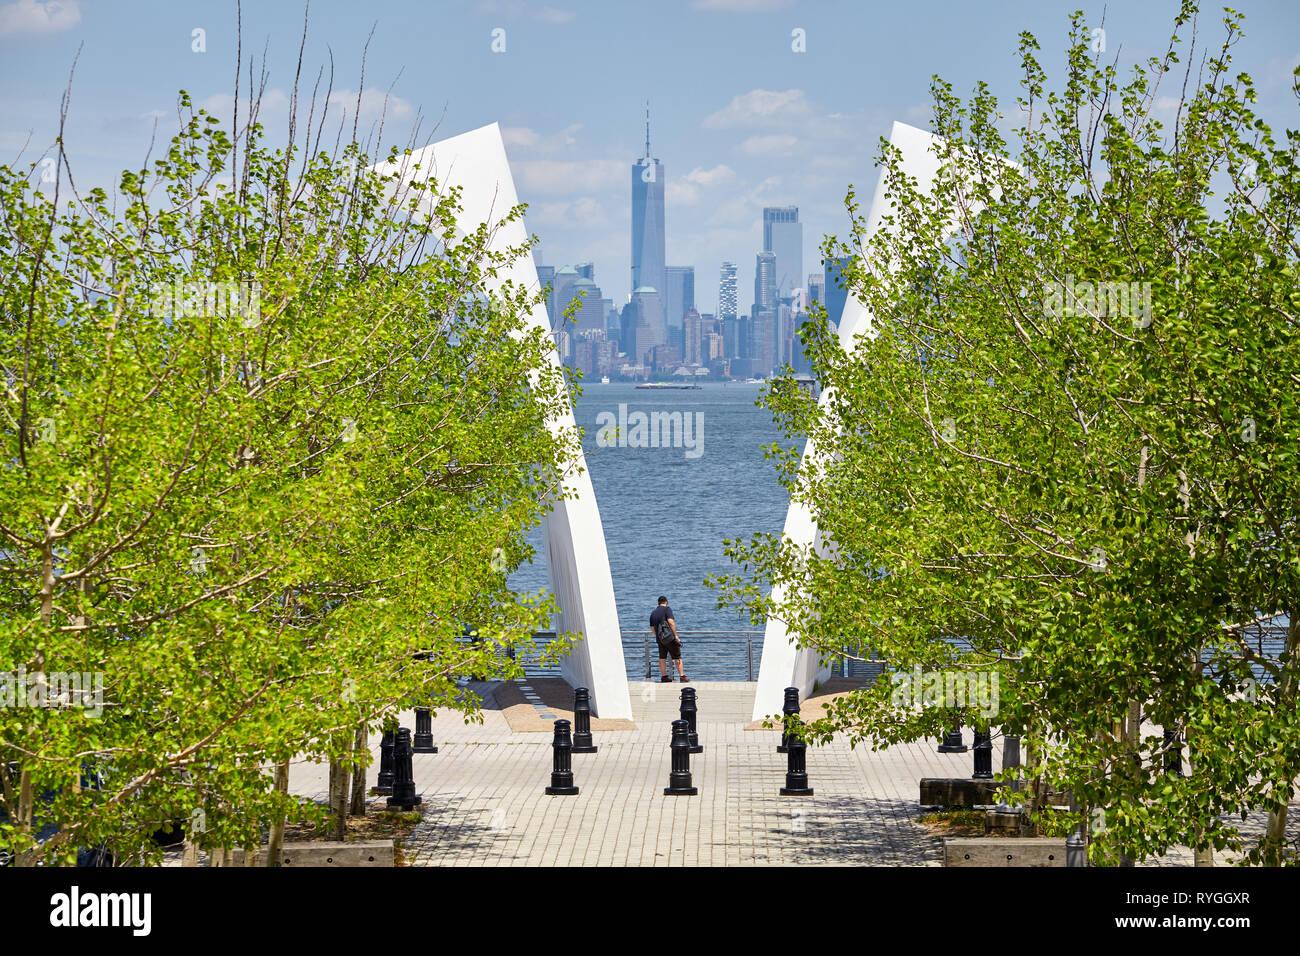 New York, USA - June 29, 2018: Man stands between Postcards, Staten Island September 11 Memorial with Manhattan in distance. Stock Photo